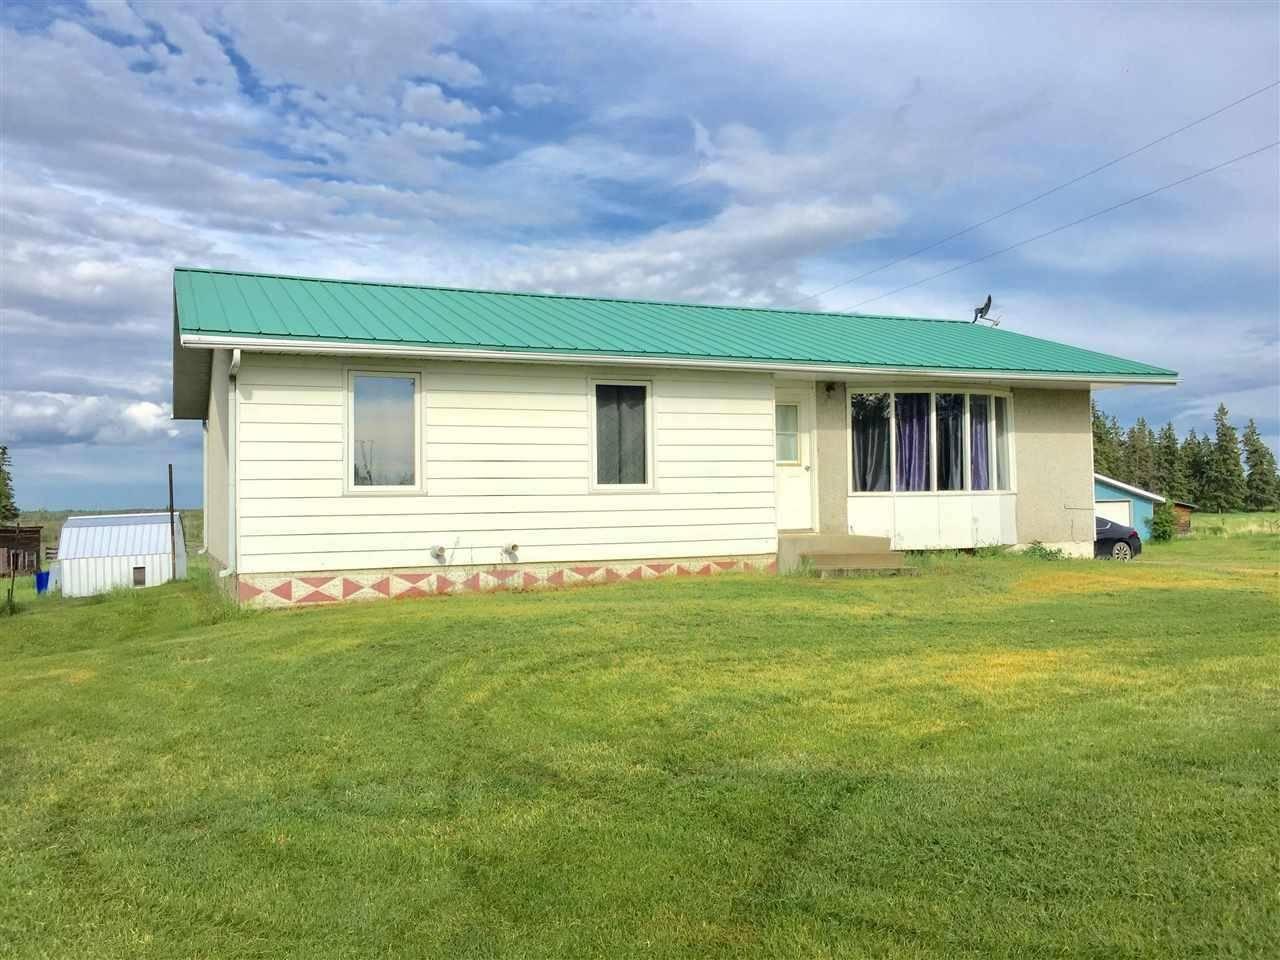 House for sale at 62509 Rge Rd Rural Bonnyville M.d. Alberta - MLS: E4162208